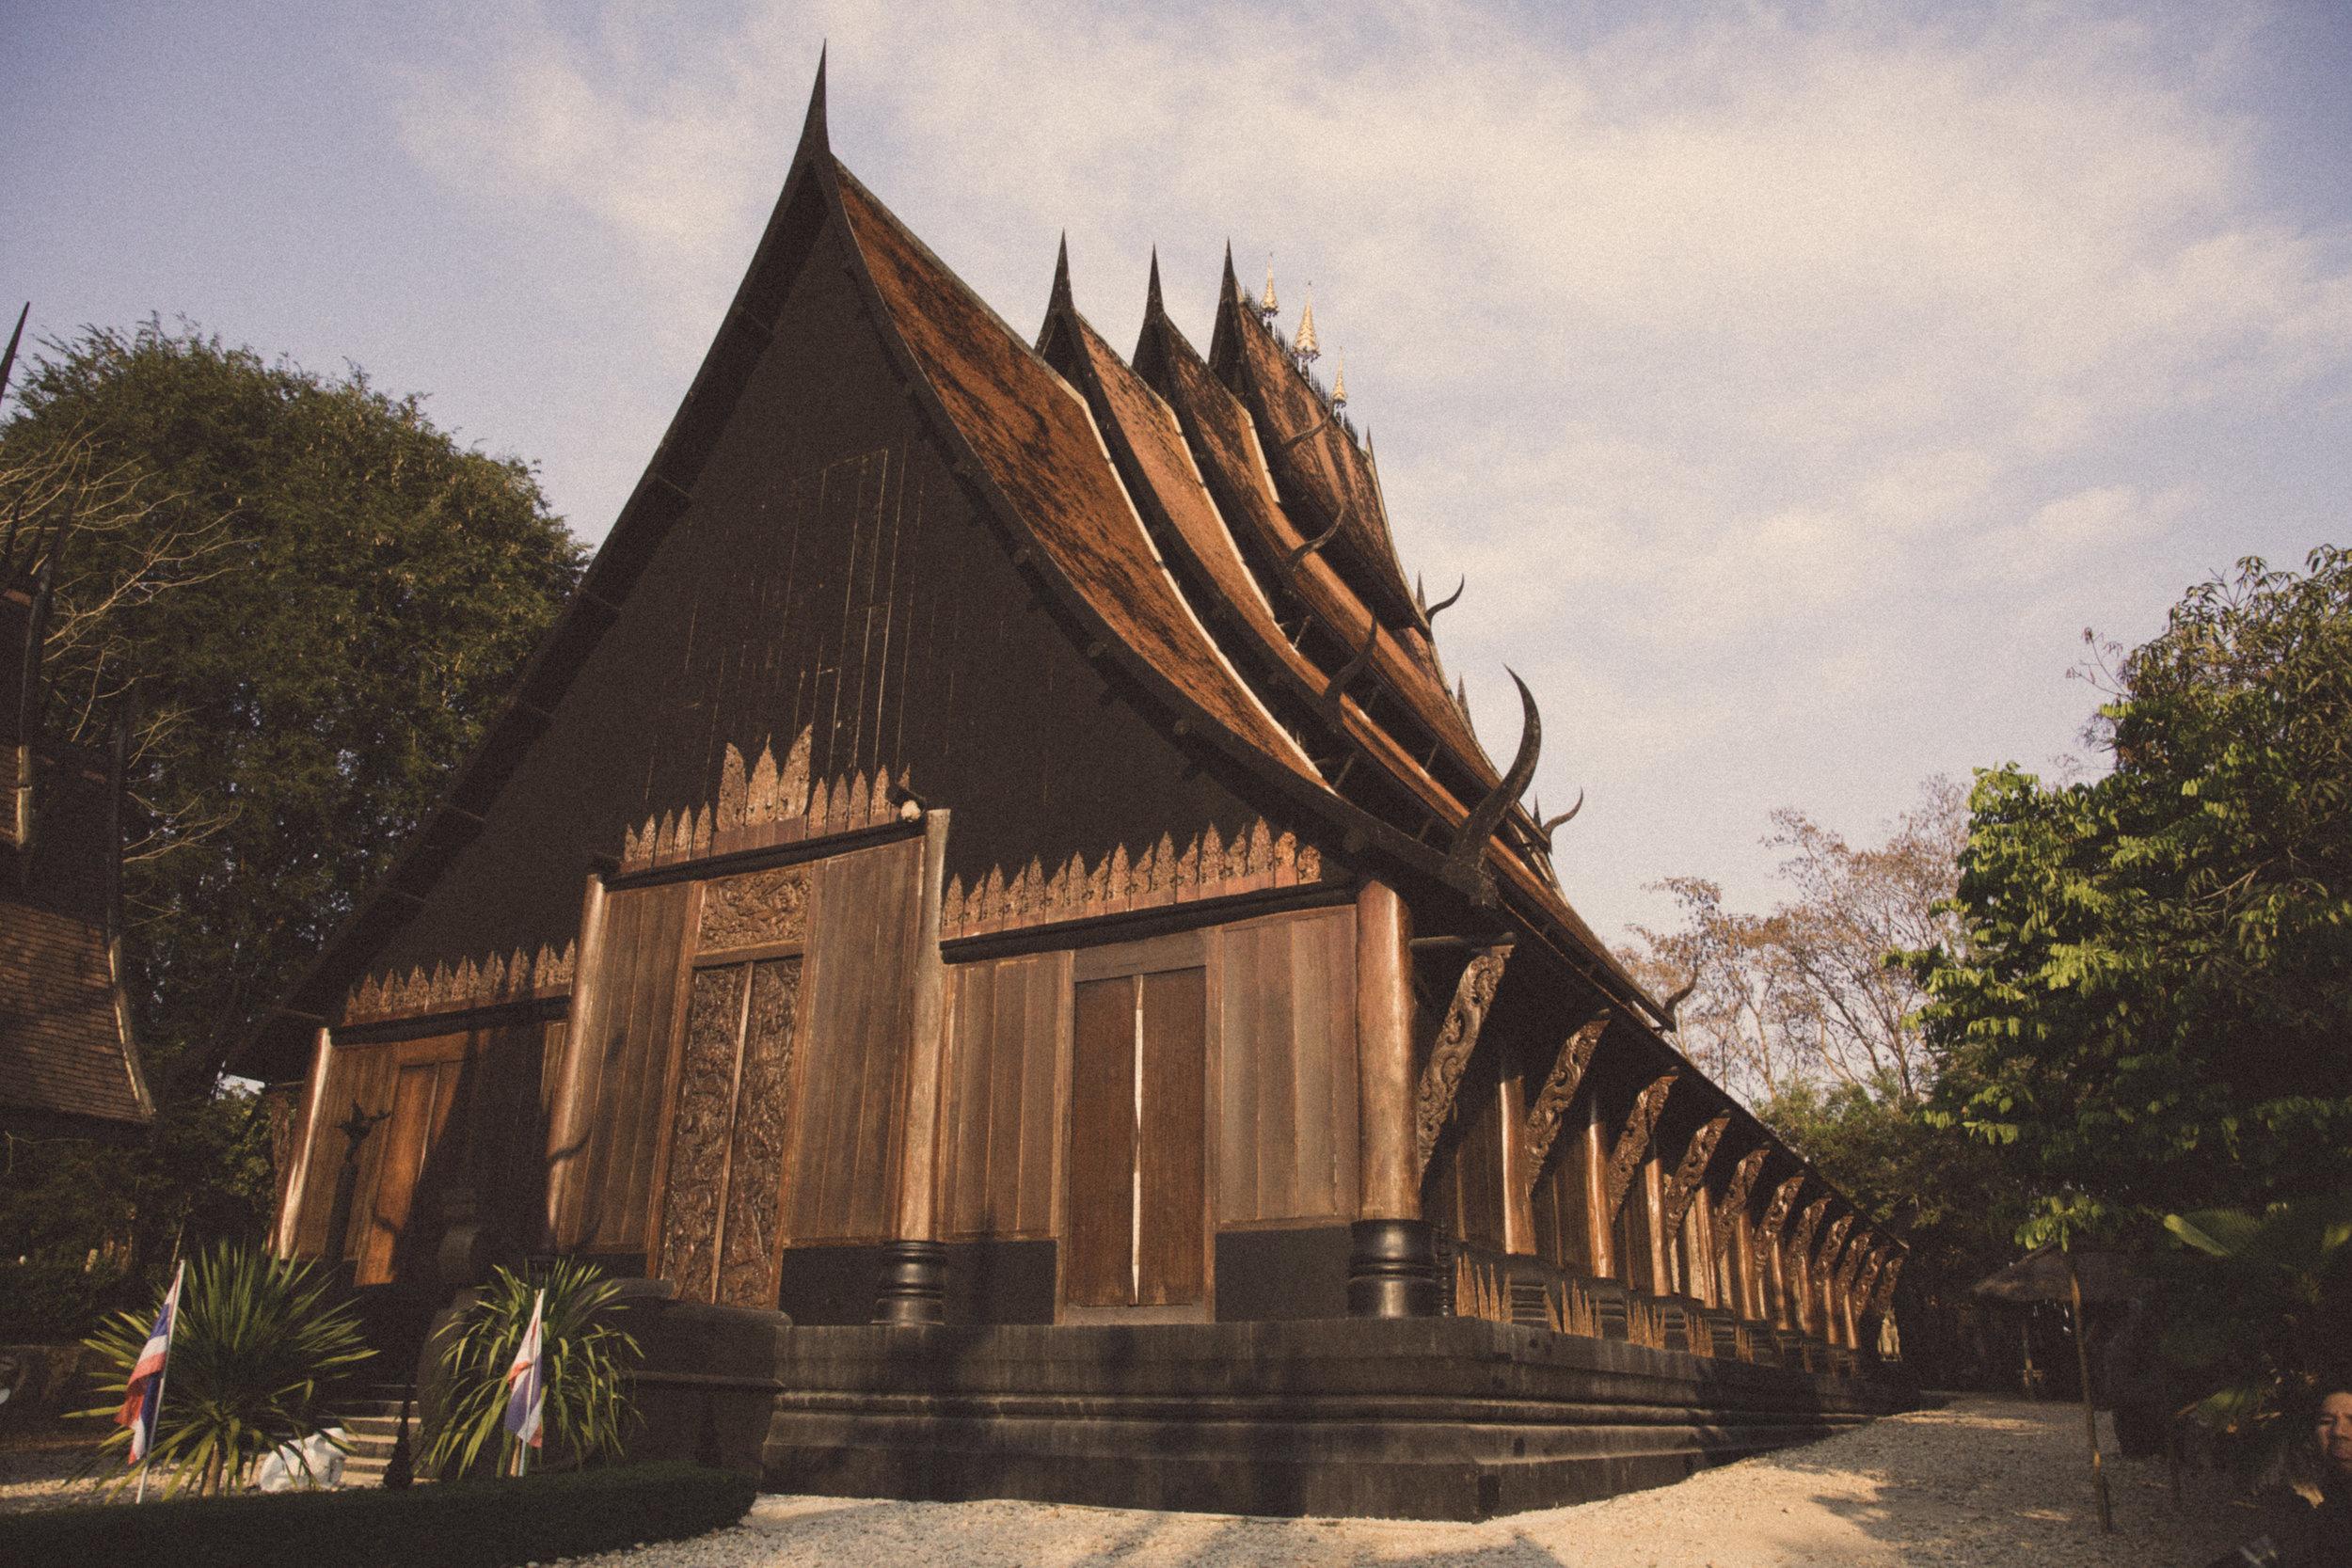 The Black Temple